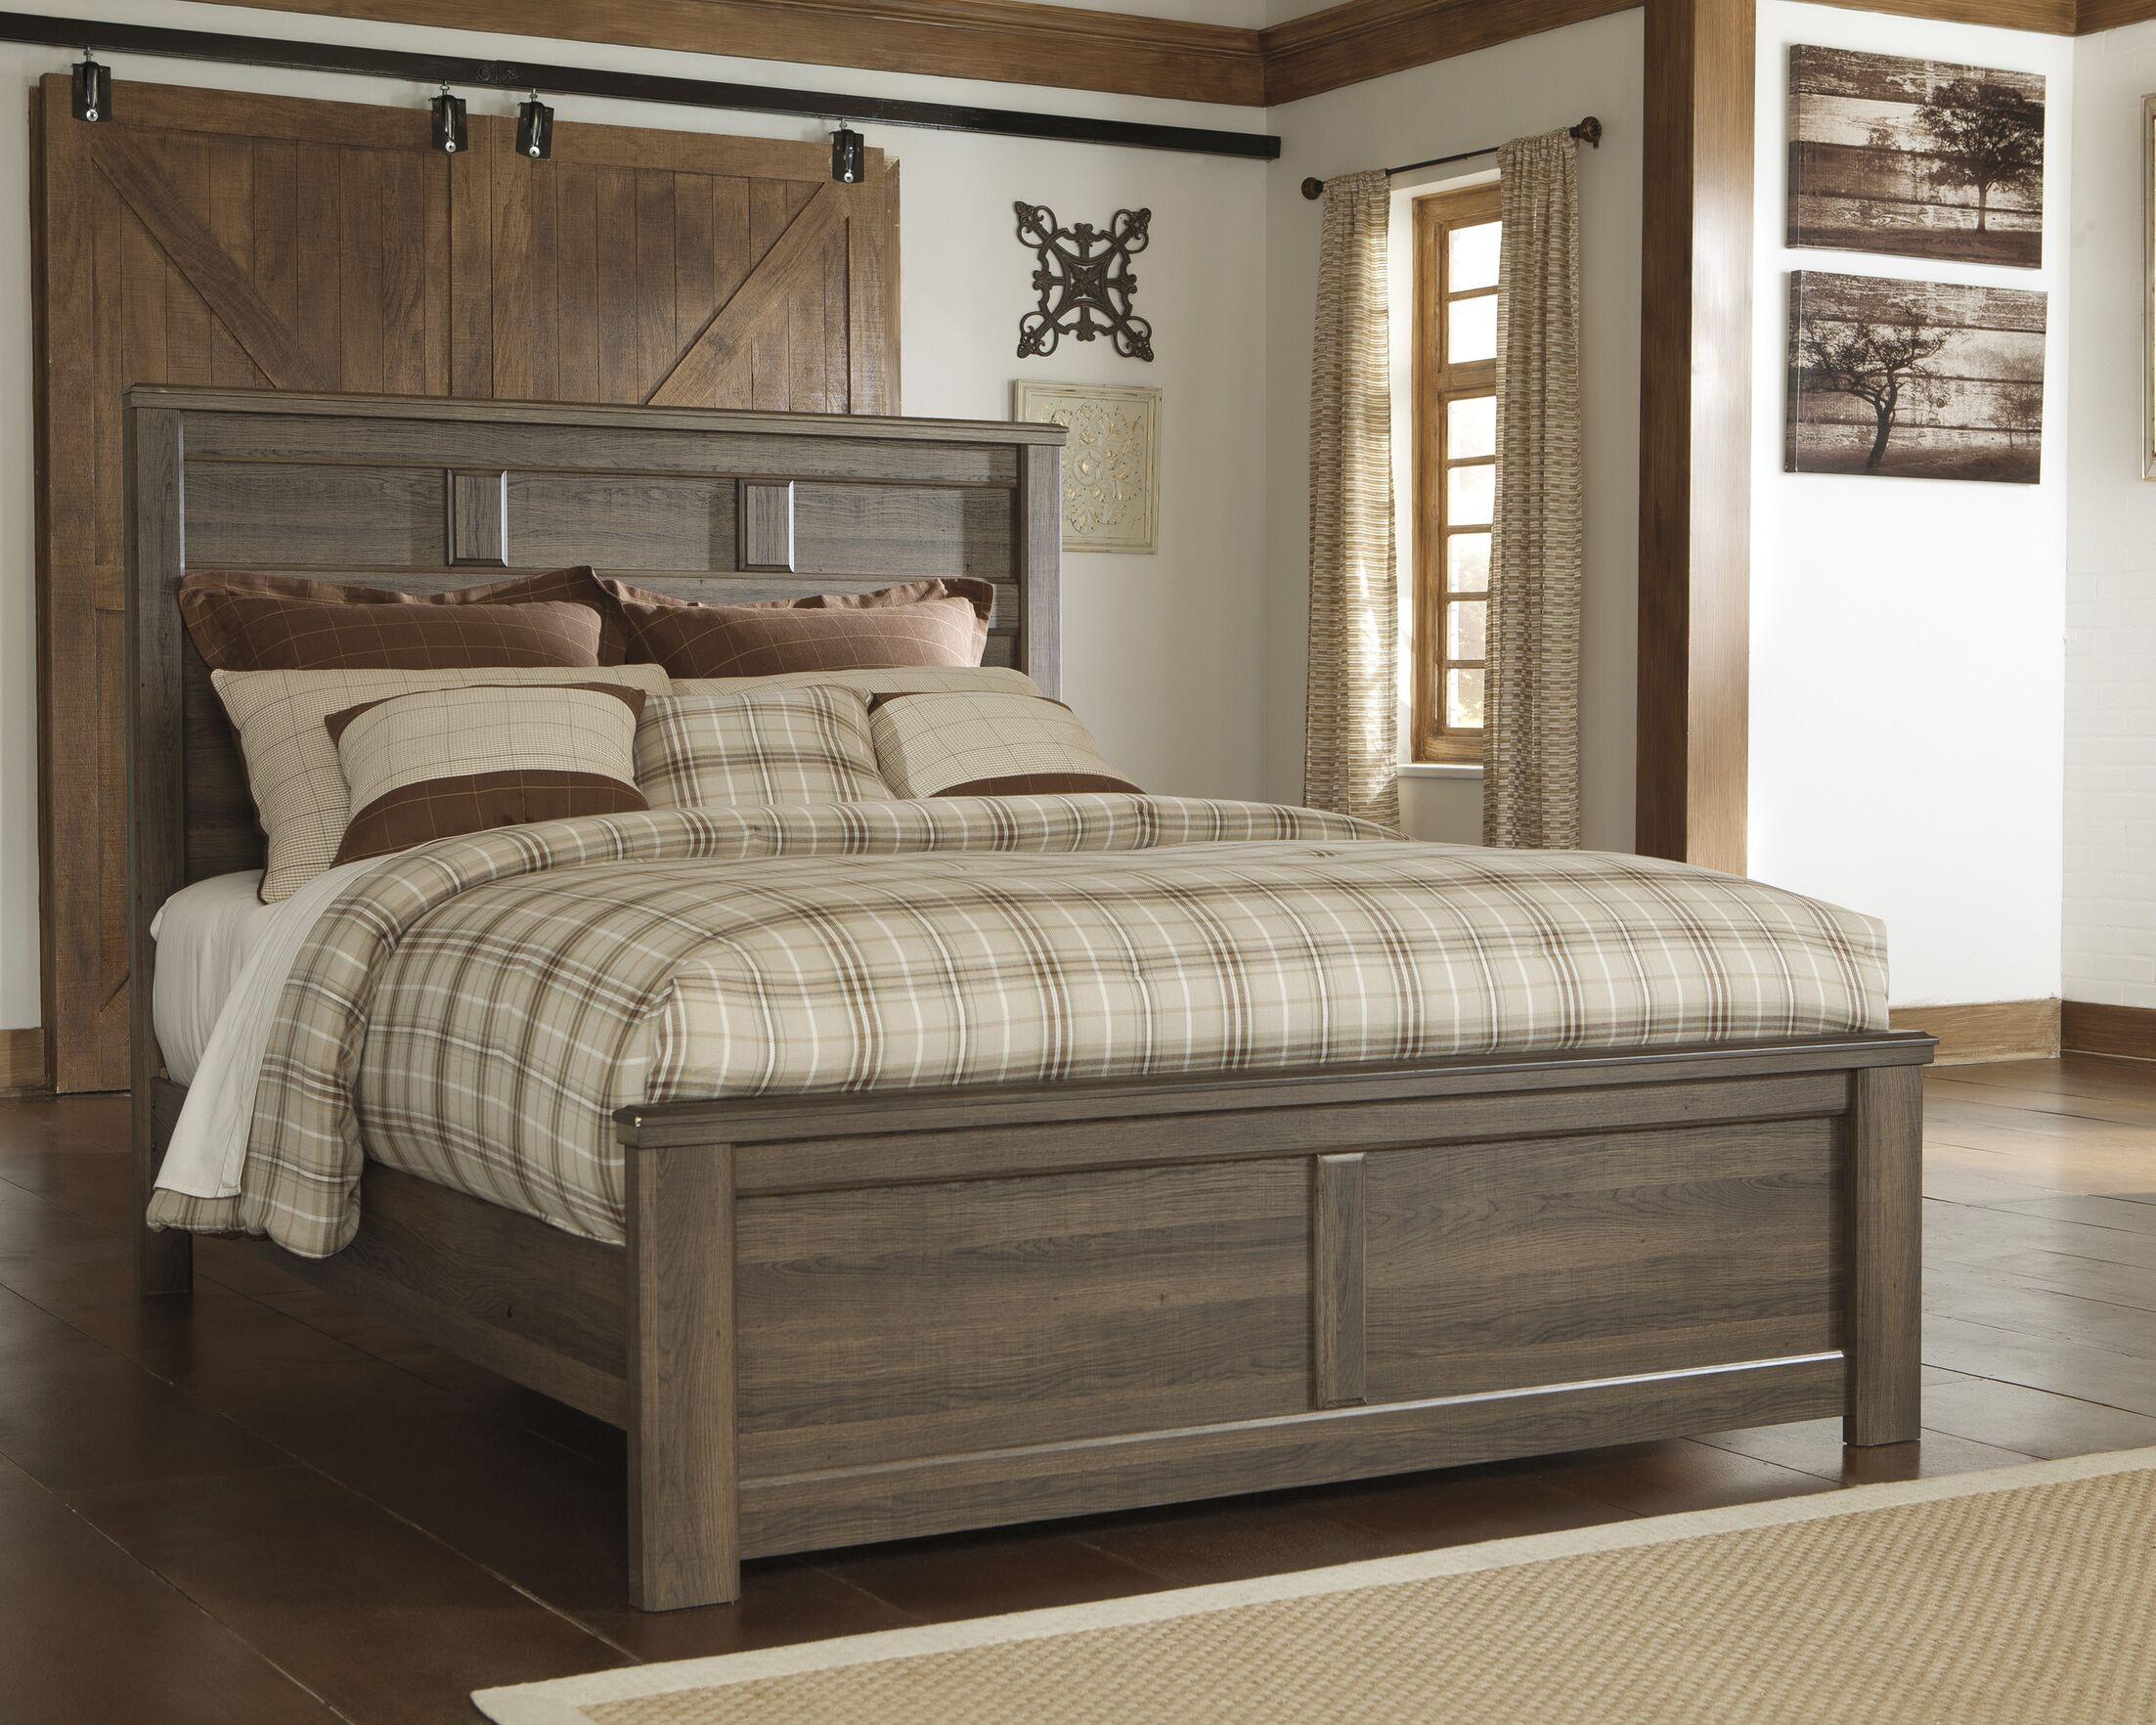 Ridgecrest Panel Bed